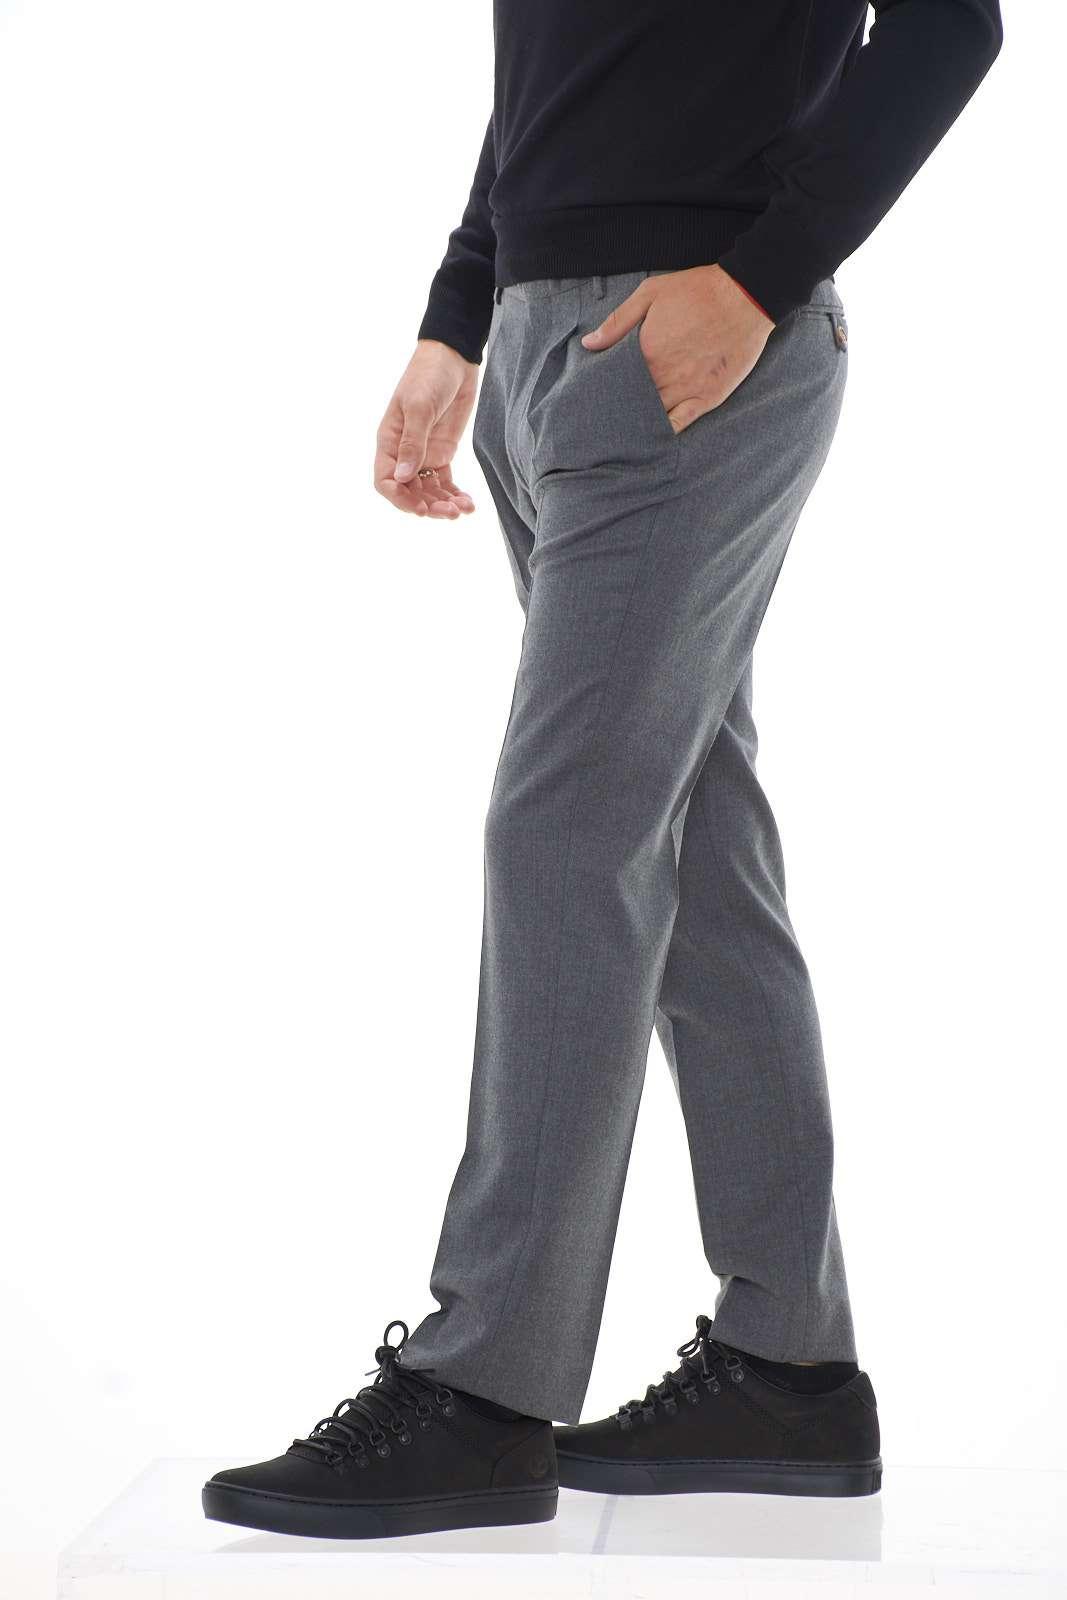 https://www.parmax.com/media/catalog/product/a/i/ai-outlet_parmax-pantaloni-uomo-entre-amis-a198355520-b.jpg